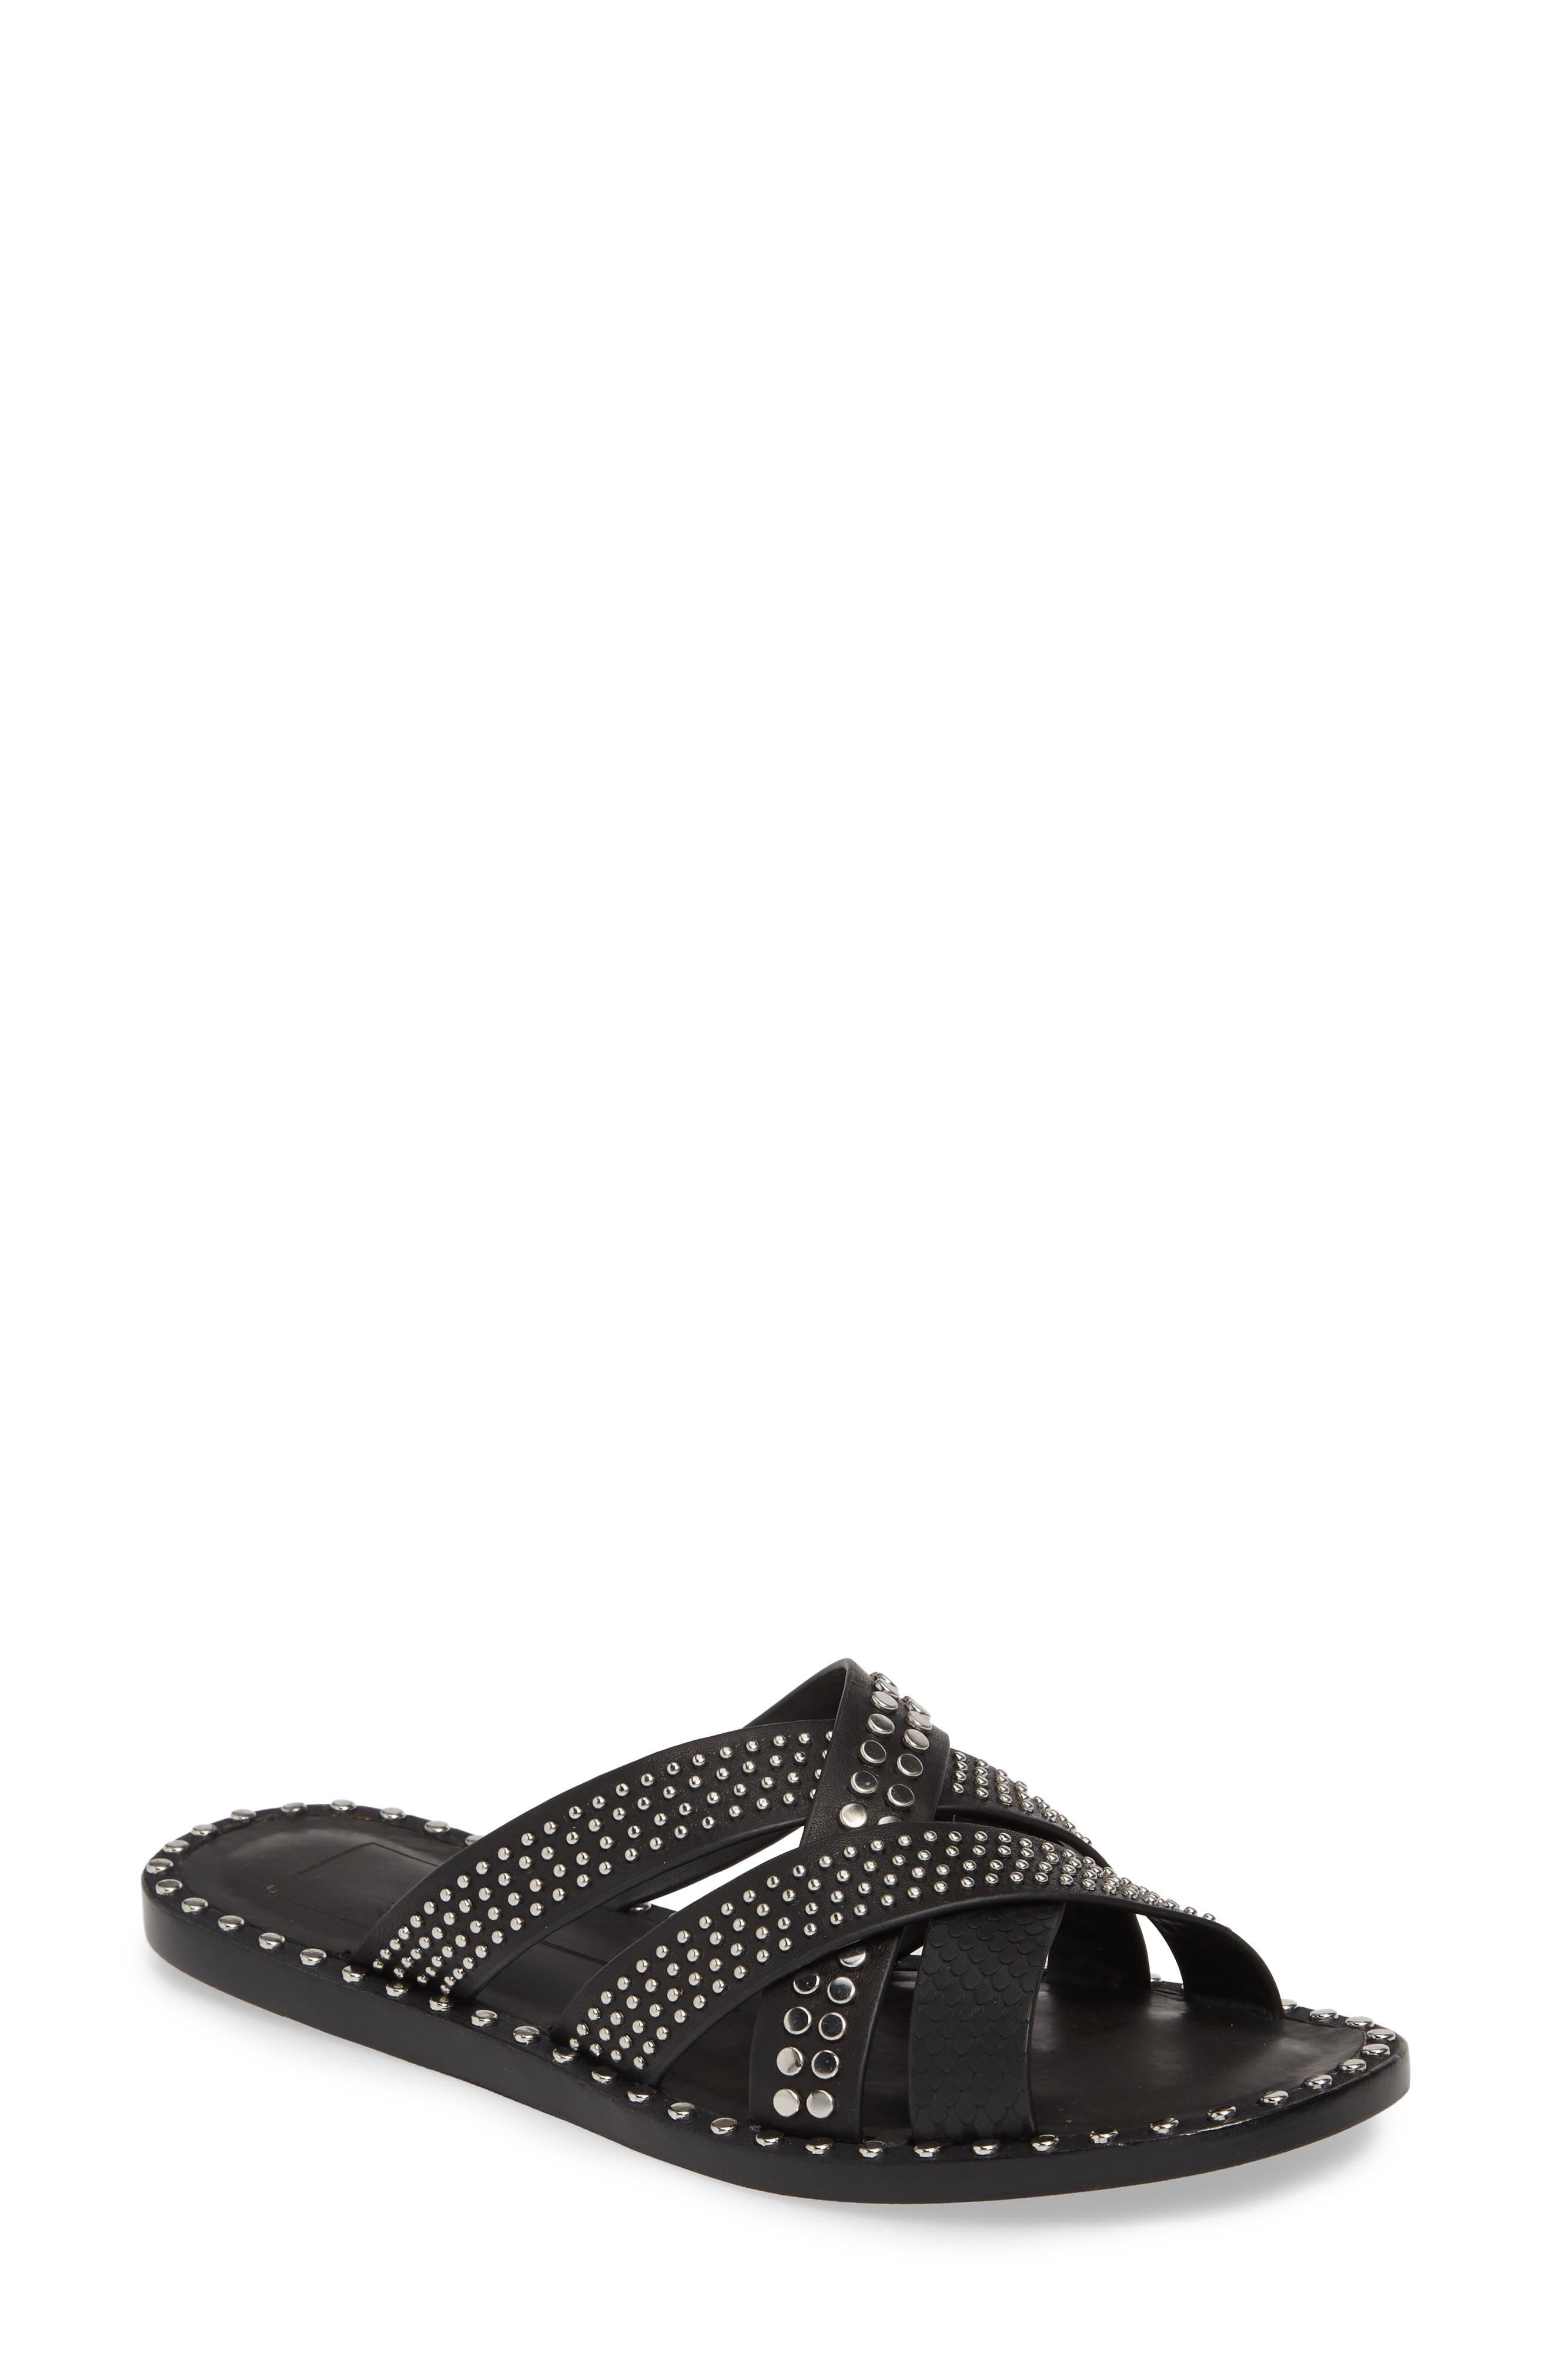 DOLCE VITA, Corbey Studded Slide Sandal, Main thumbnail 1, color, BLACK LEATHER